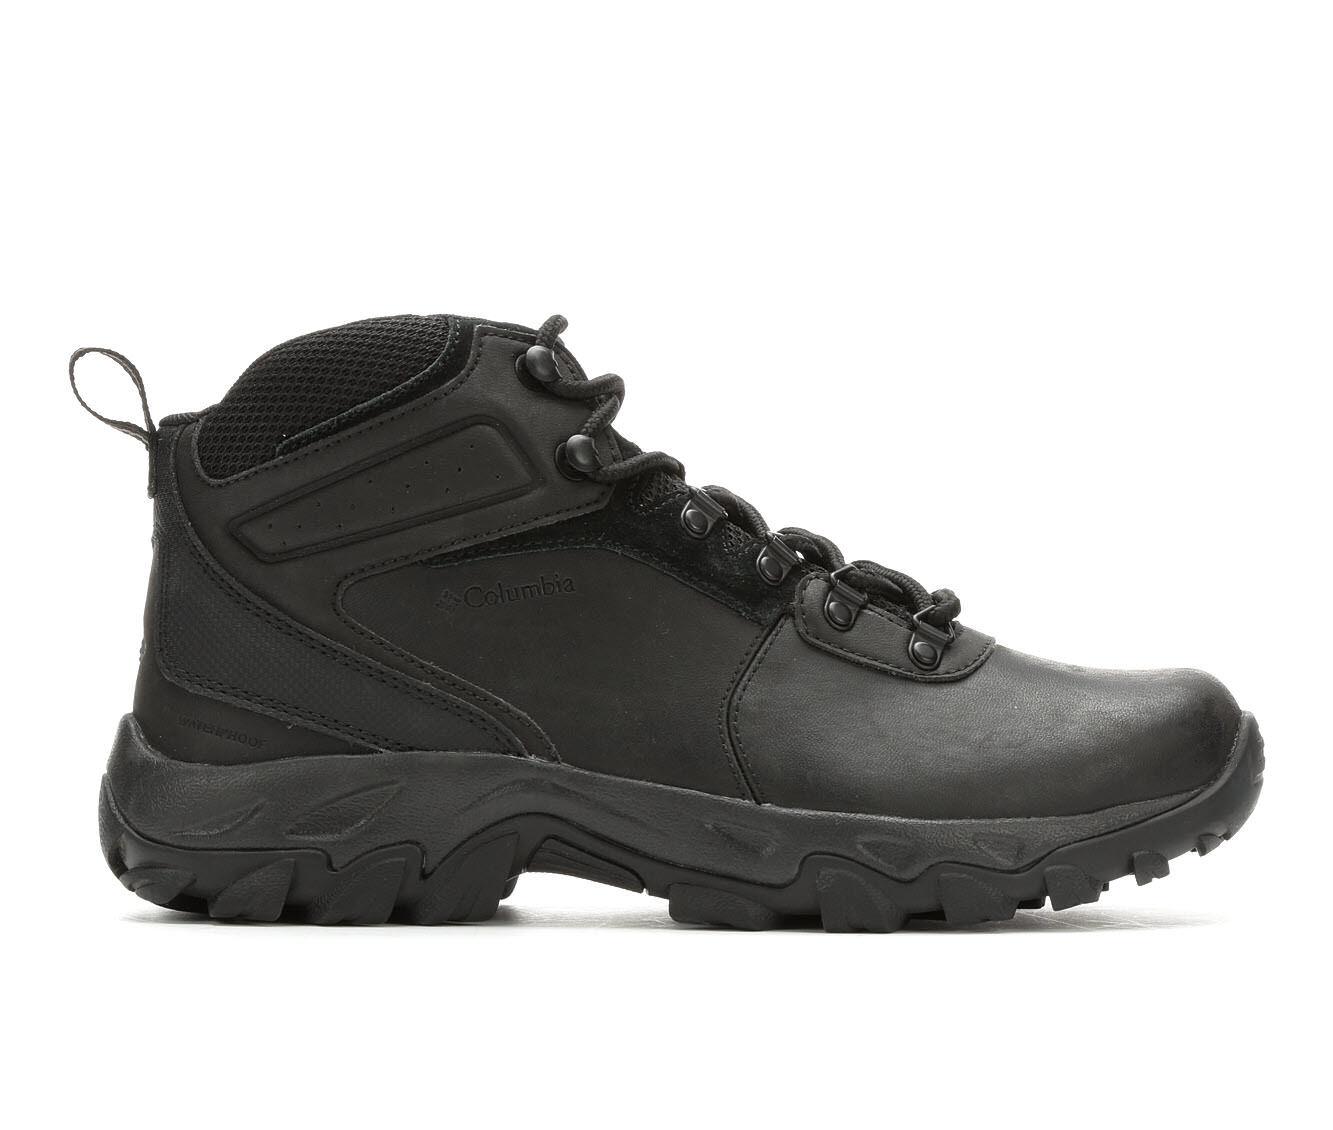 Men's Columbia Newton Ridge Plus II Waterproof Hiking Boots Black/Black